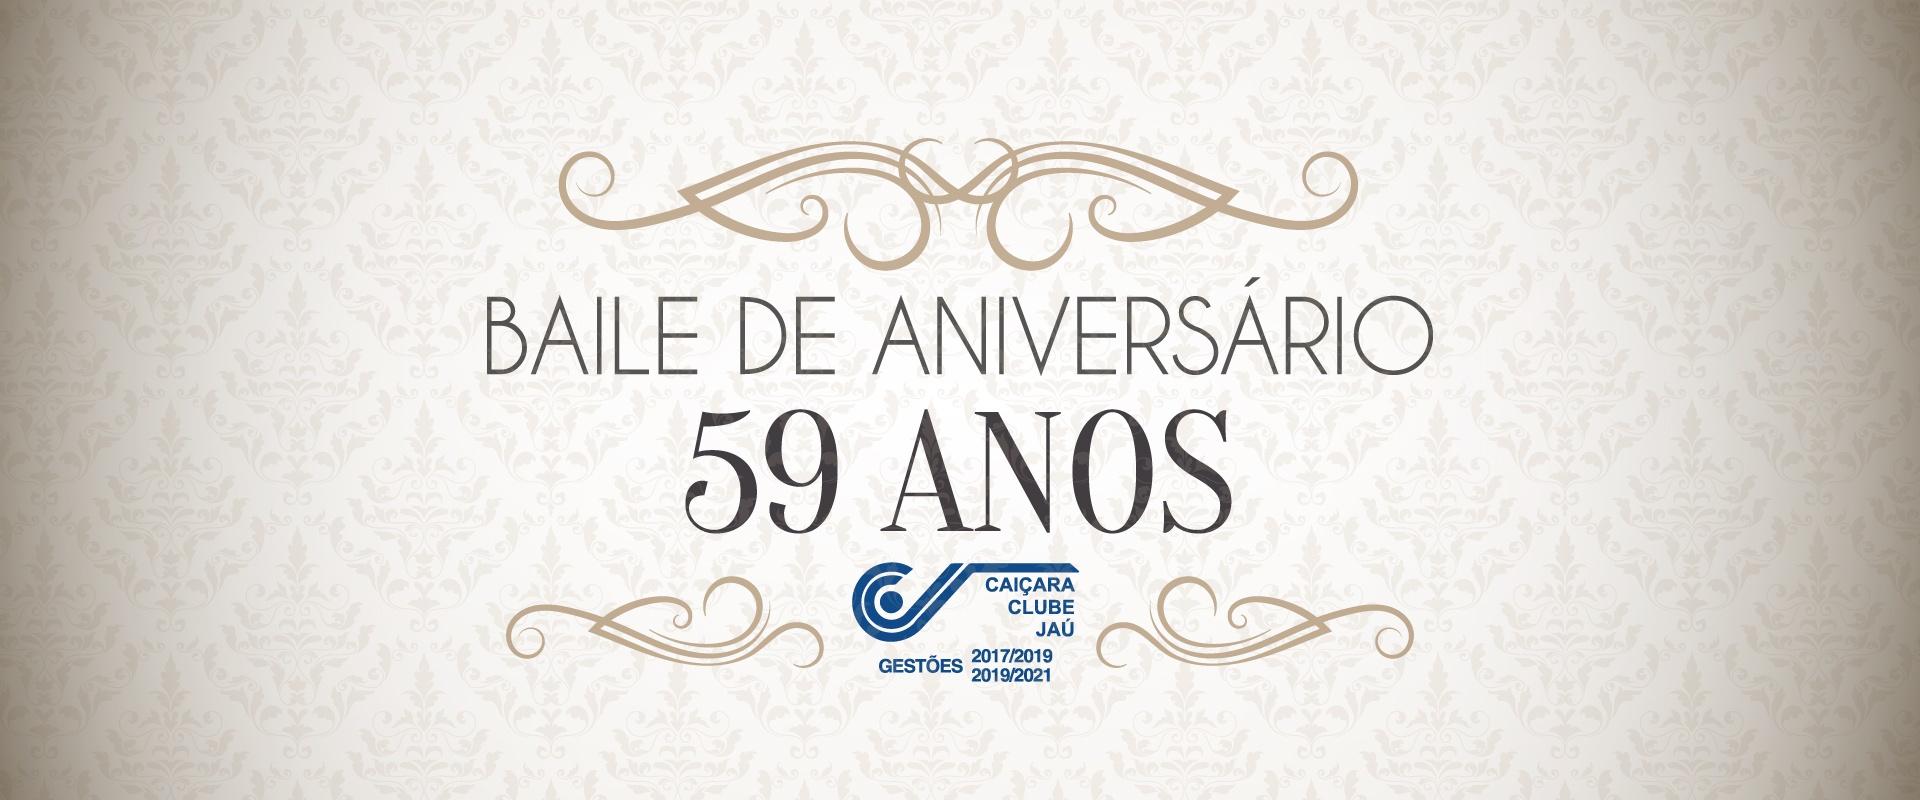 site_baile aniversario_Site_banner